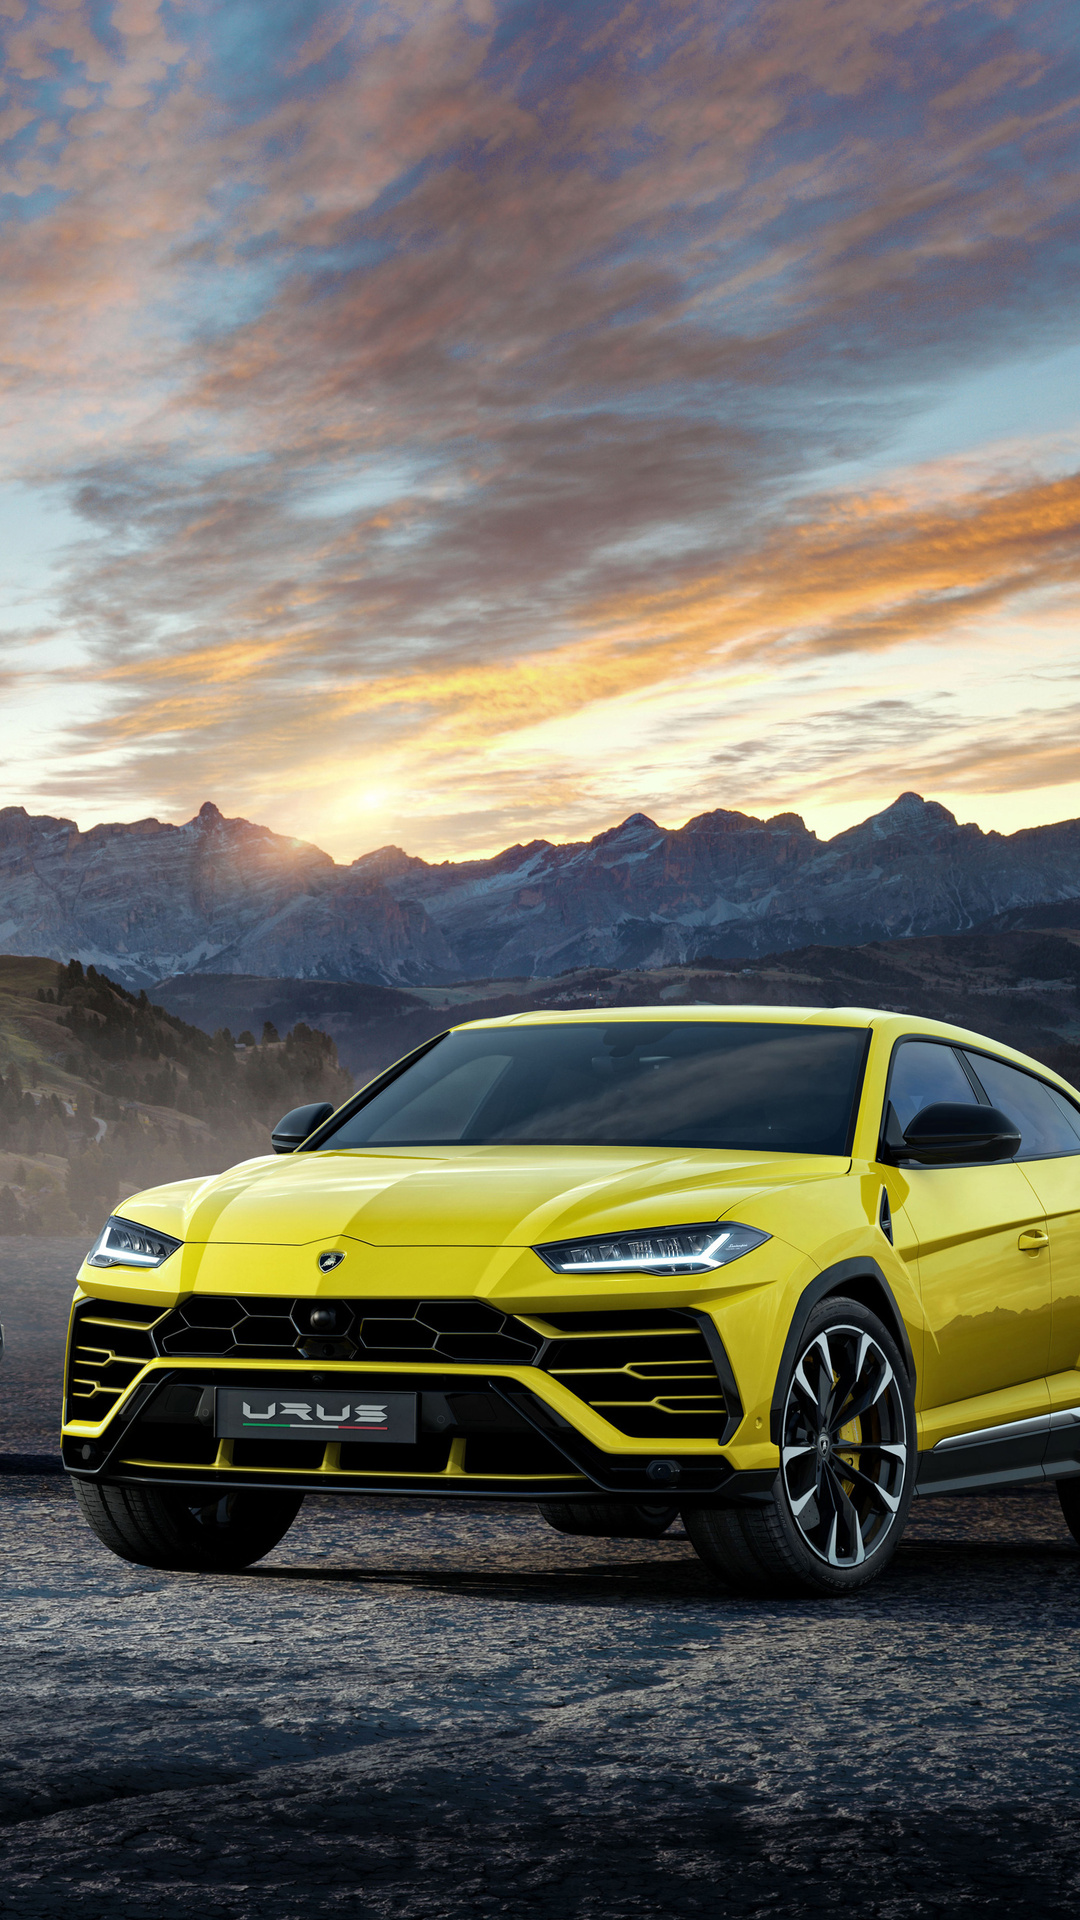 1080x1920 Lamborghini Urus Black And Yellow 4k Iphone 7 6s 6 Plus